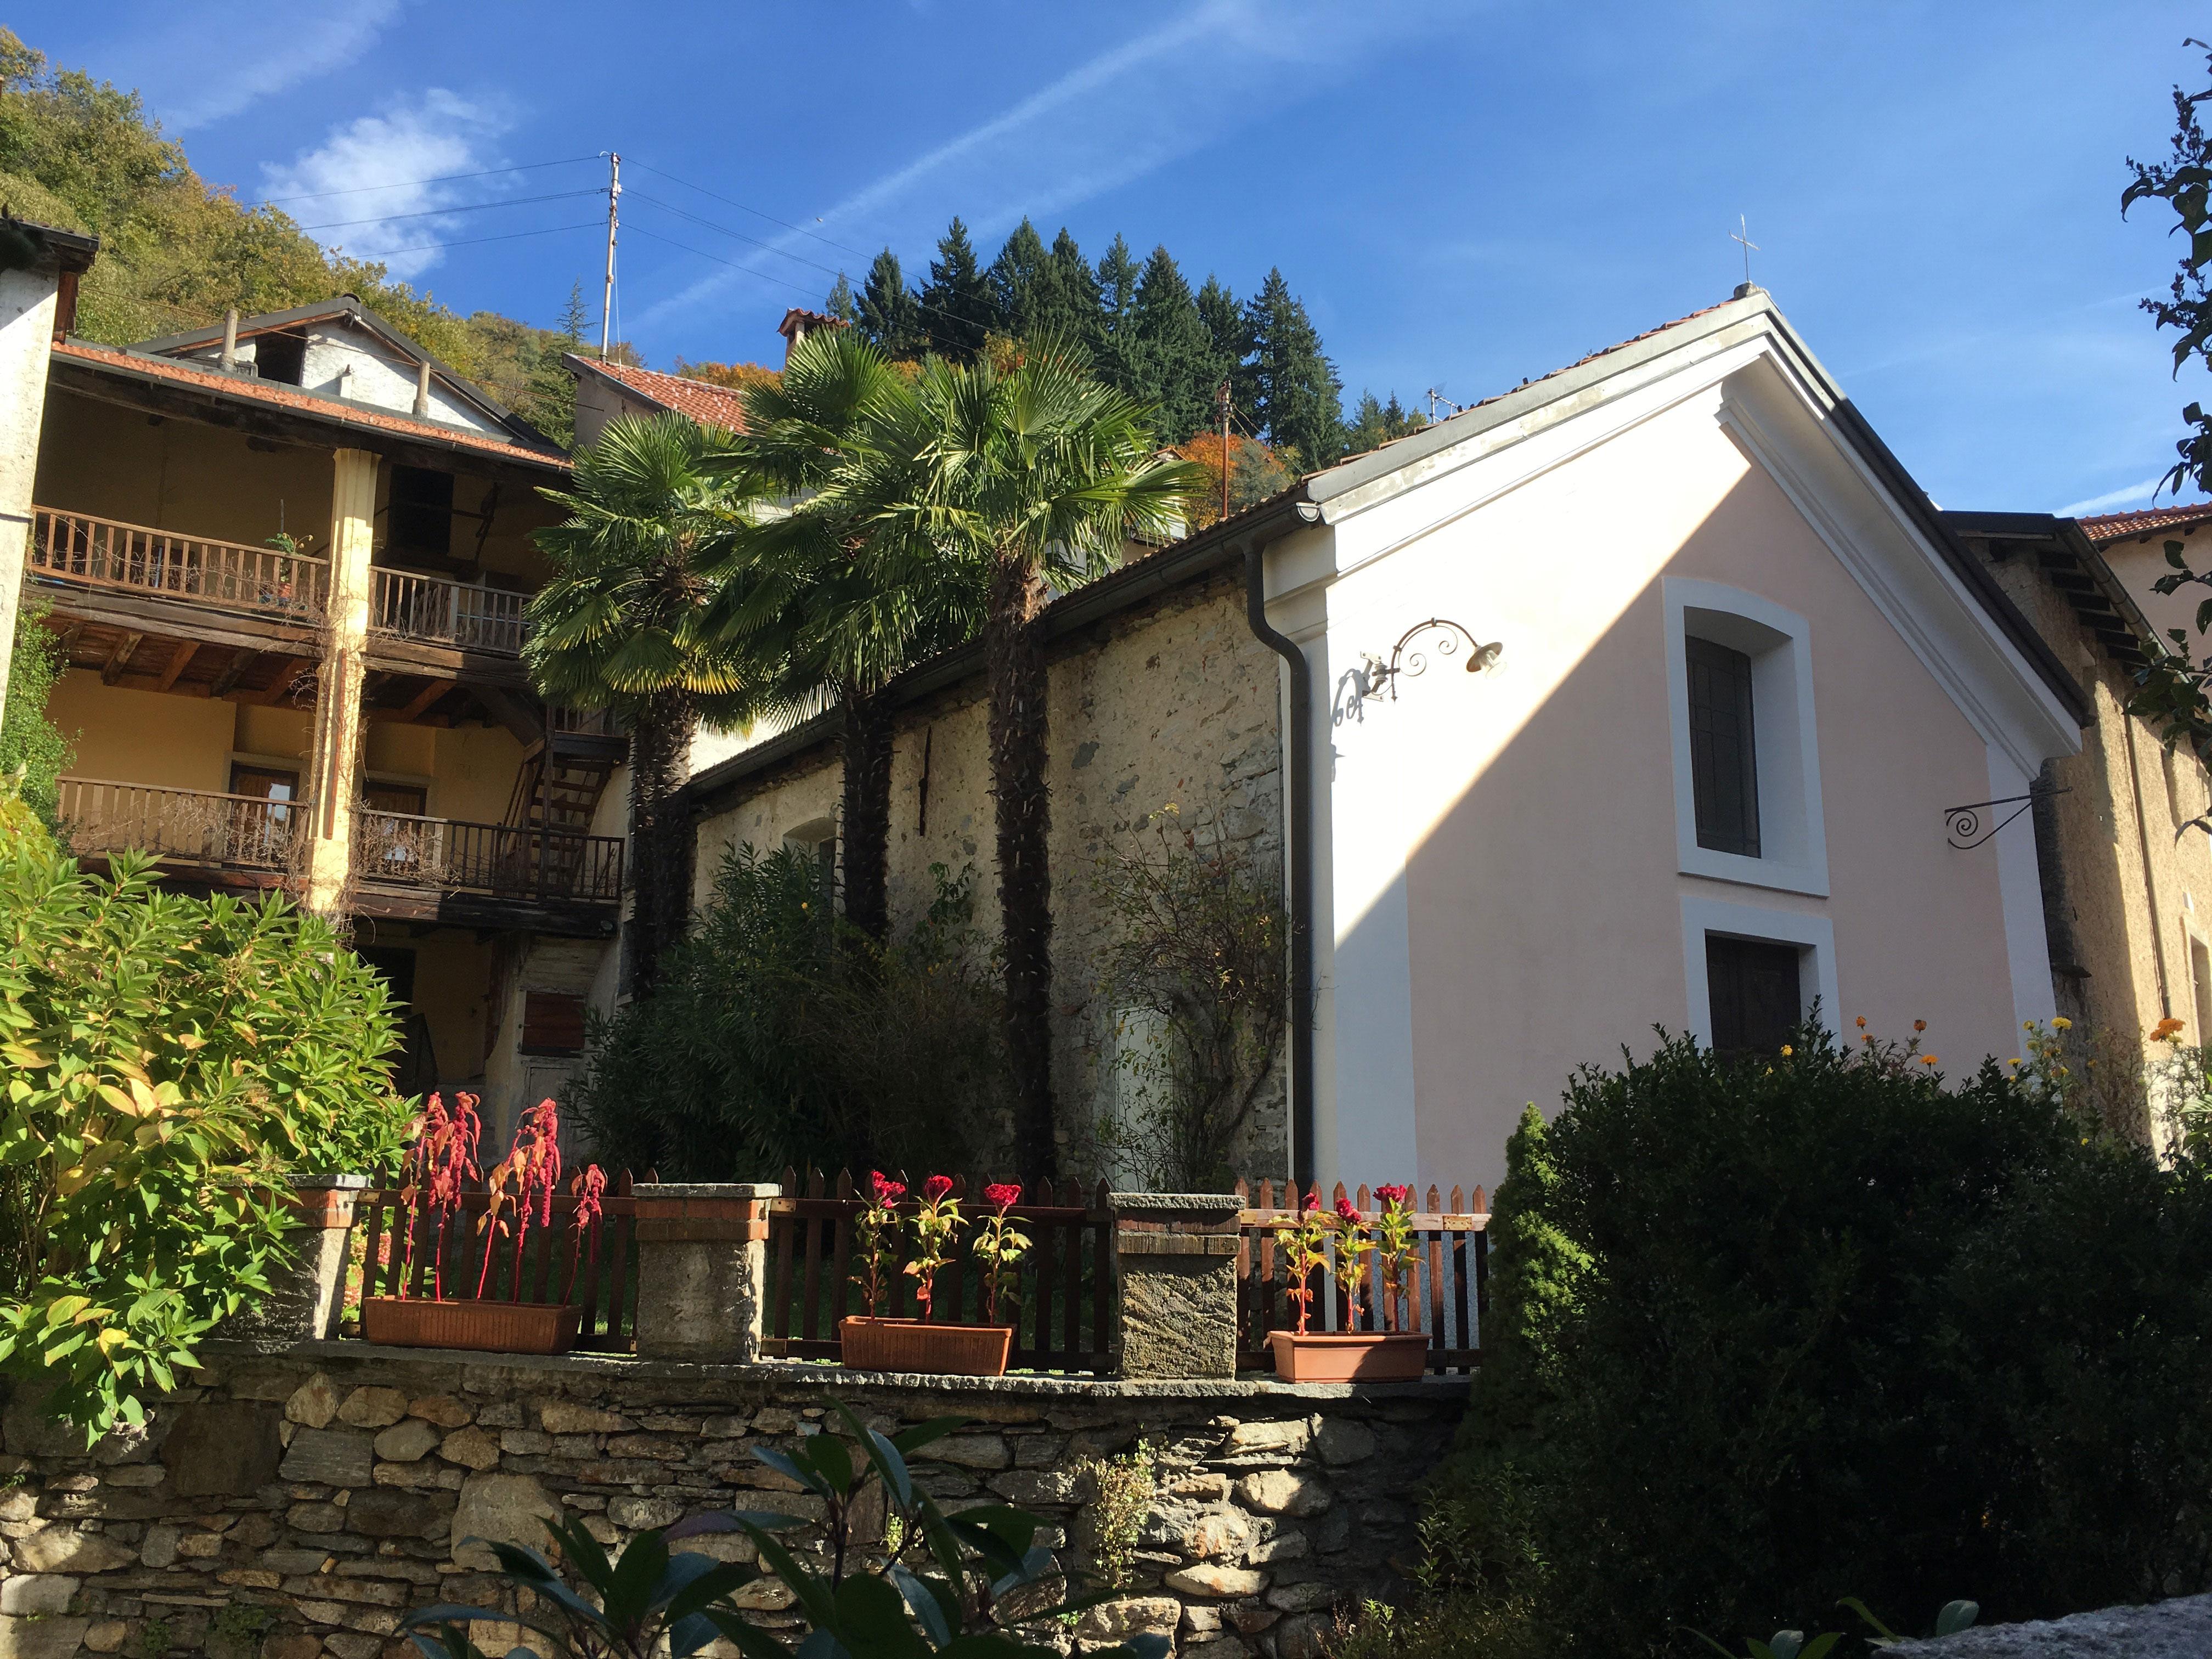 File:Astano-Sant-Antonio-Abate-aussen-Umgebung.jpg - Wikimedia Commons